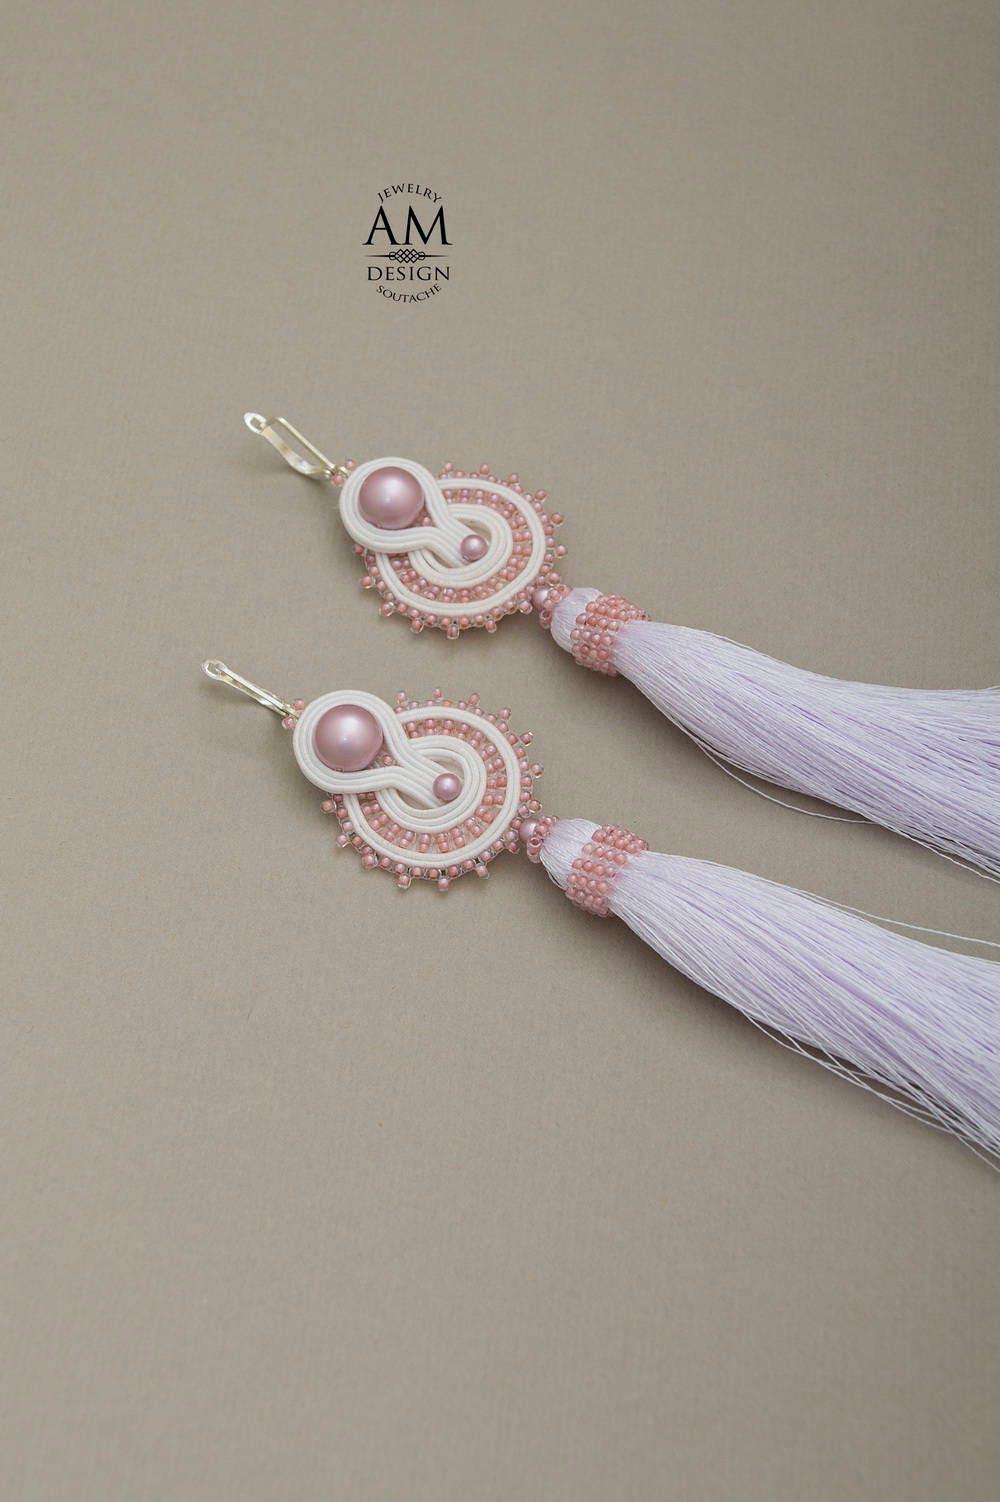 Chandelier earrings earrings jewelry wedding chandelier earrings pink wedding earrings for bride pink pearl earrings white tassel earrings wedding soutache arubaitofo Choice Image